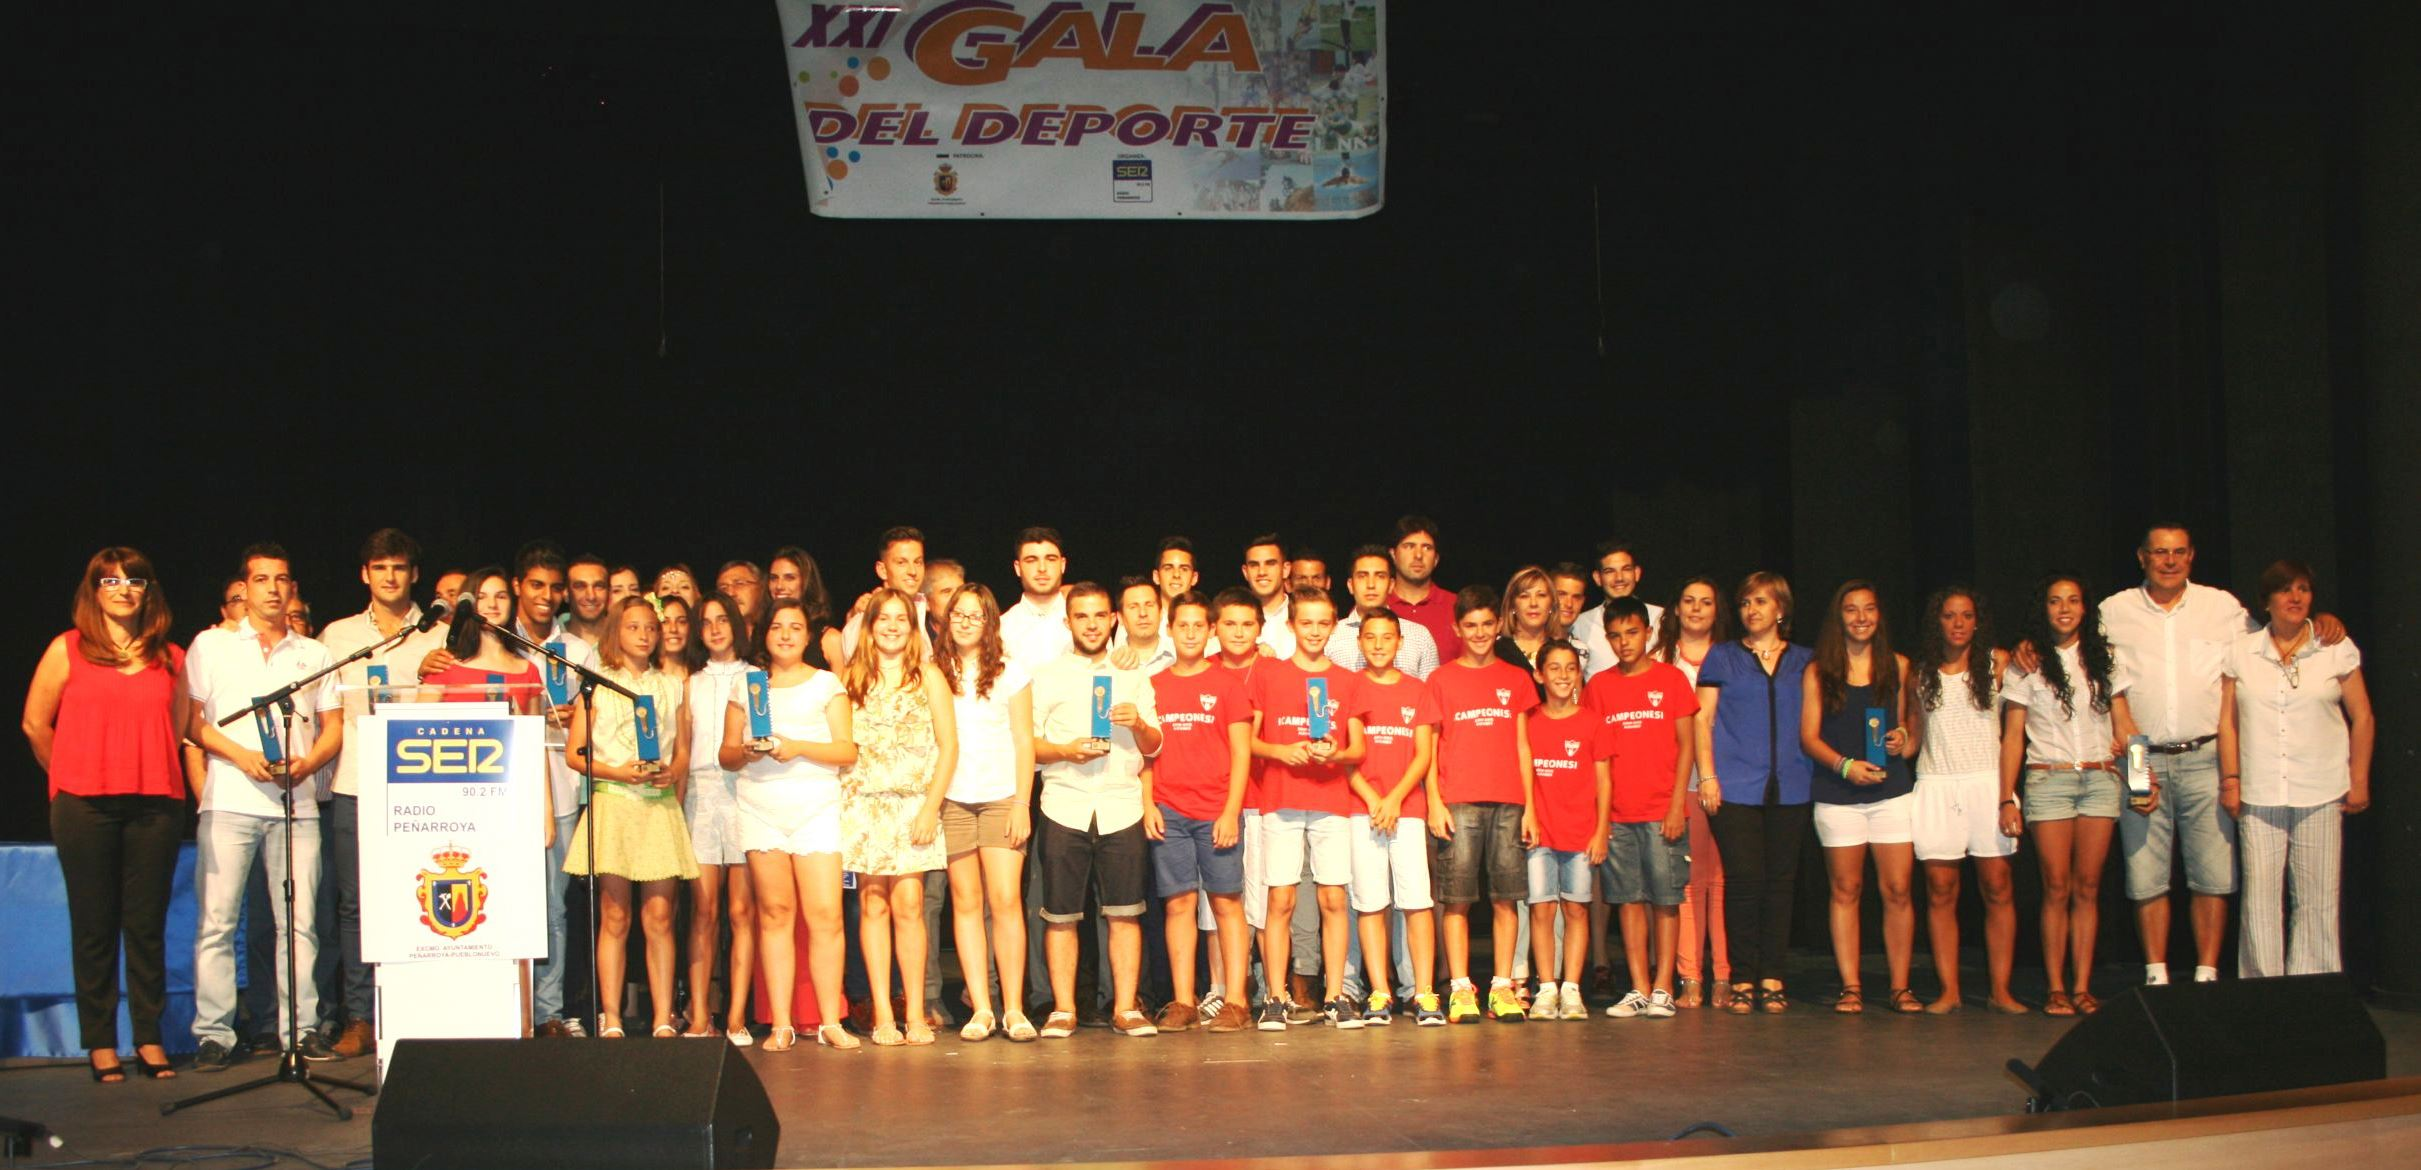 XXI Gala del Deporte Galardonados04-07-15